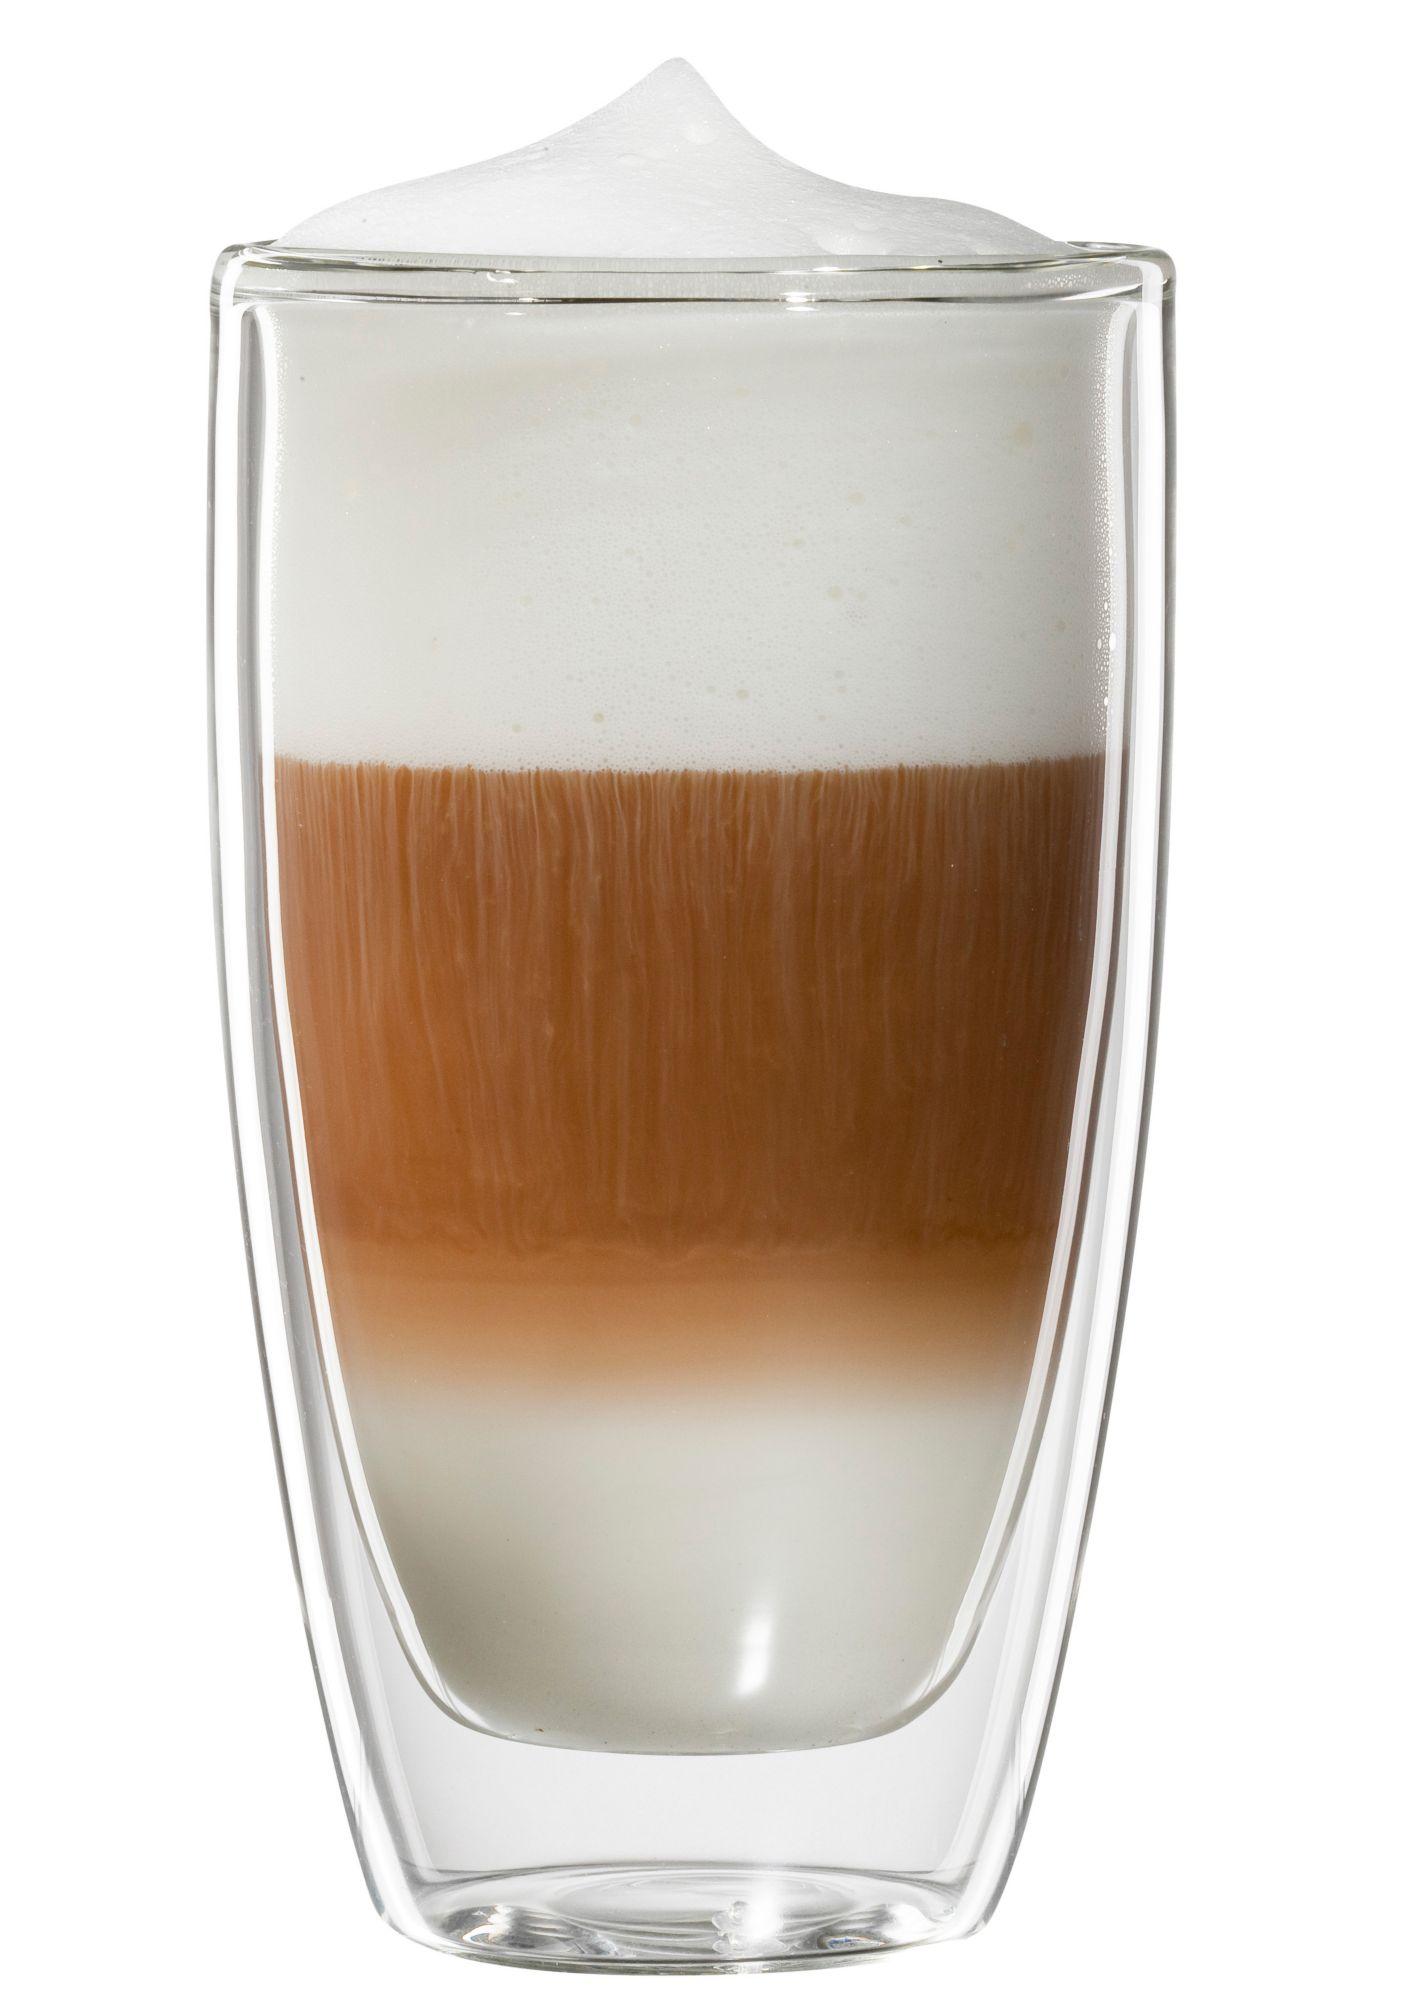 BLOOMIX bloomix Latte Macchiato-Glas, 4er Set, »Roma«, 300 ml